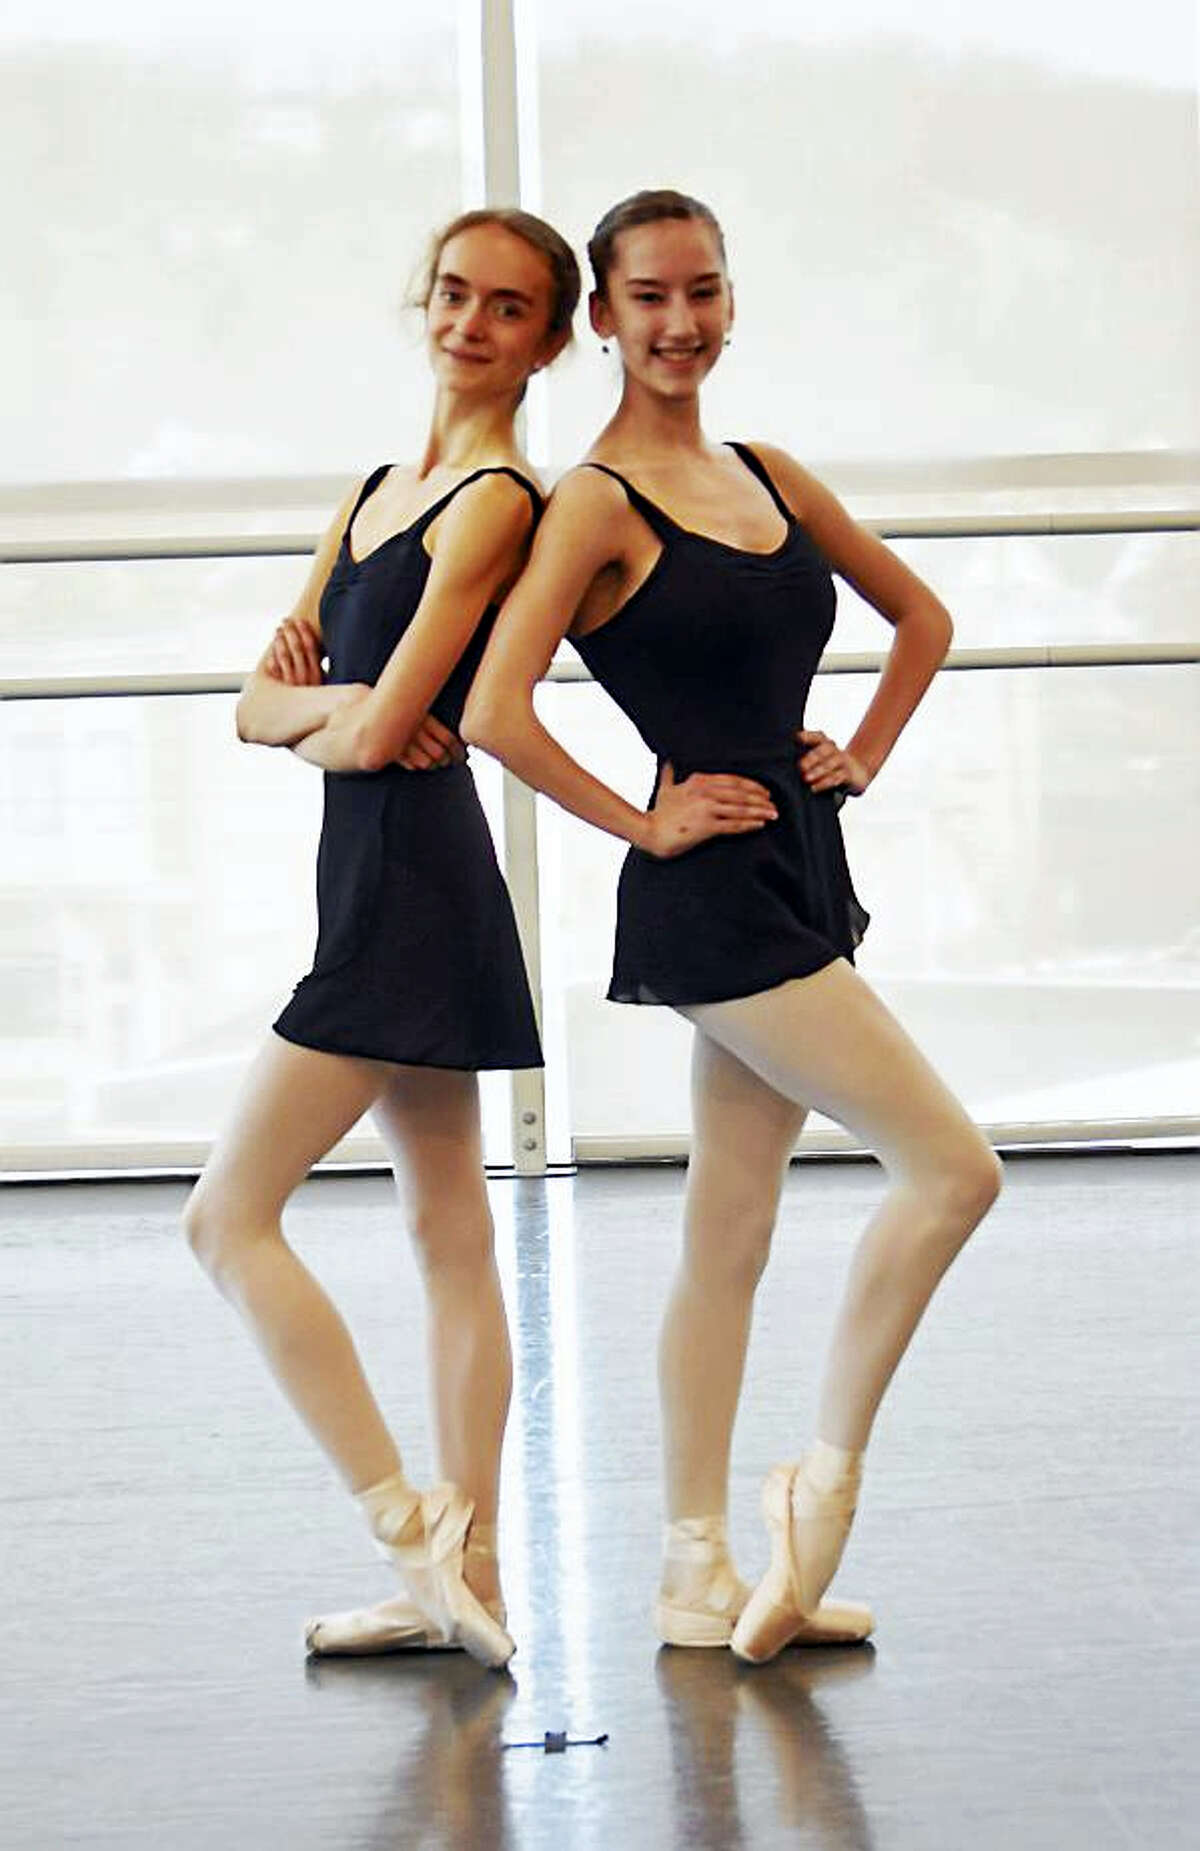 Alma Evertz and Makenna Wollmann are Nutmeg's 10-year pre-professional program graduates.